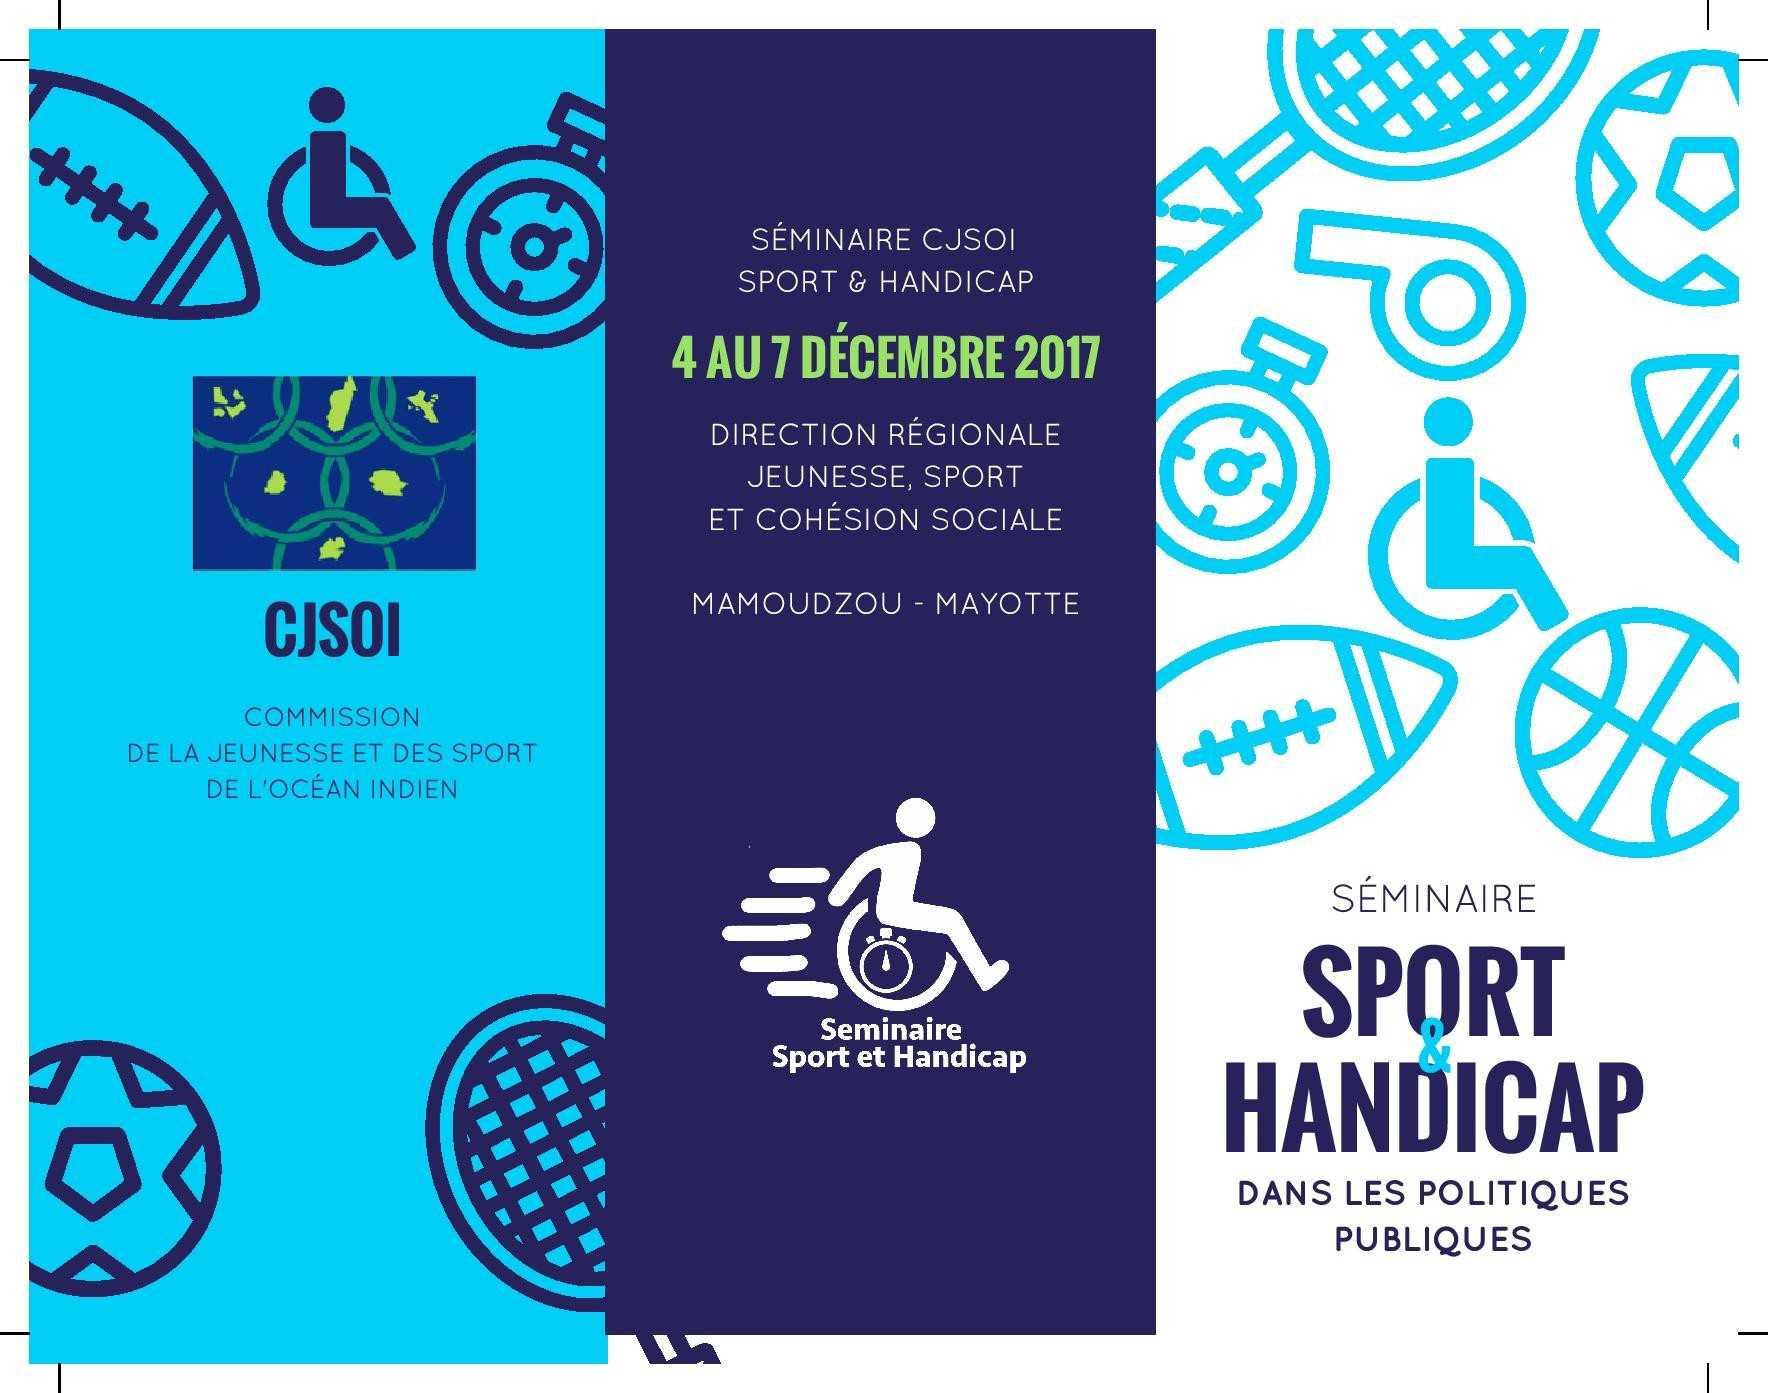 sporthandicap_impression-page-001.jpg